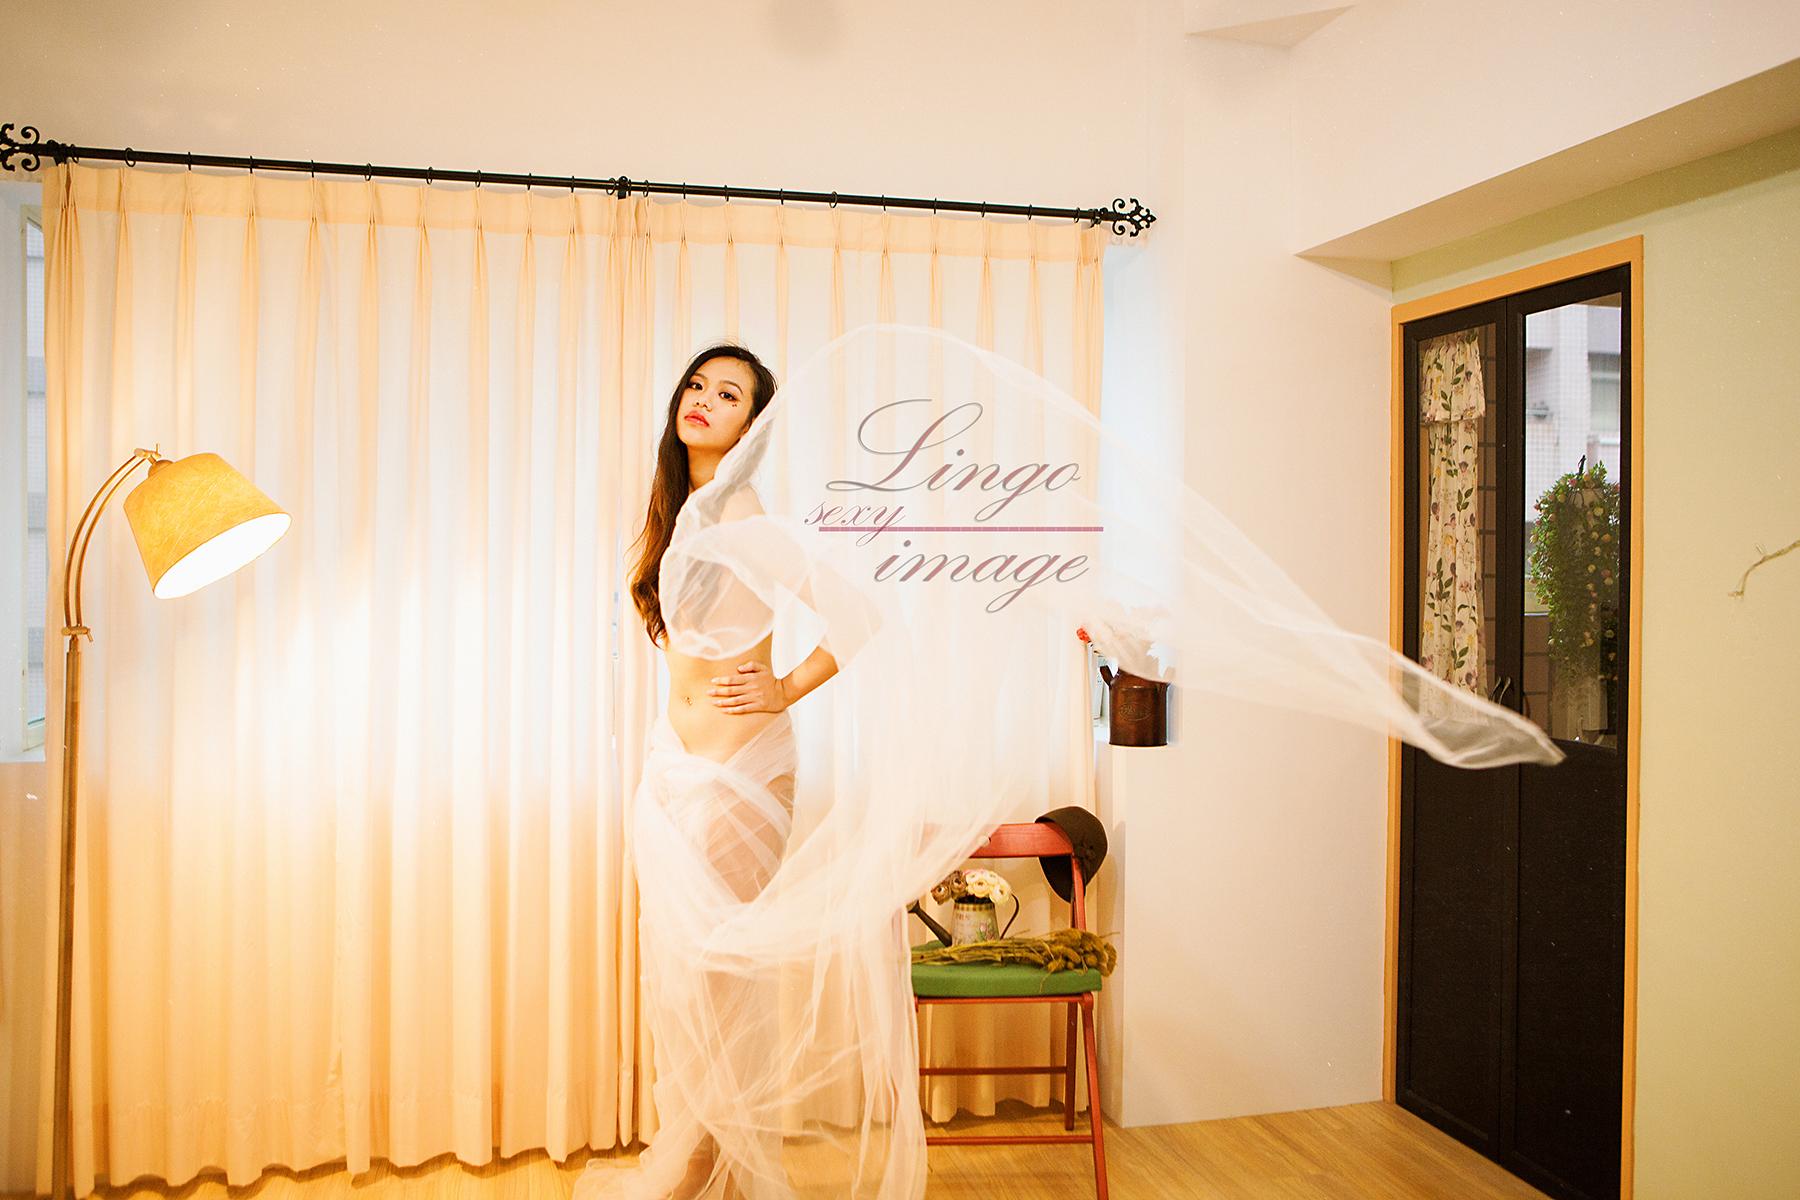 Lingo image_sexy13